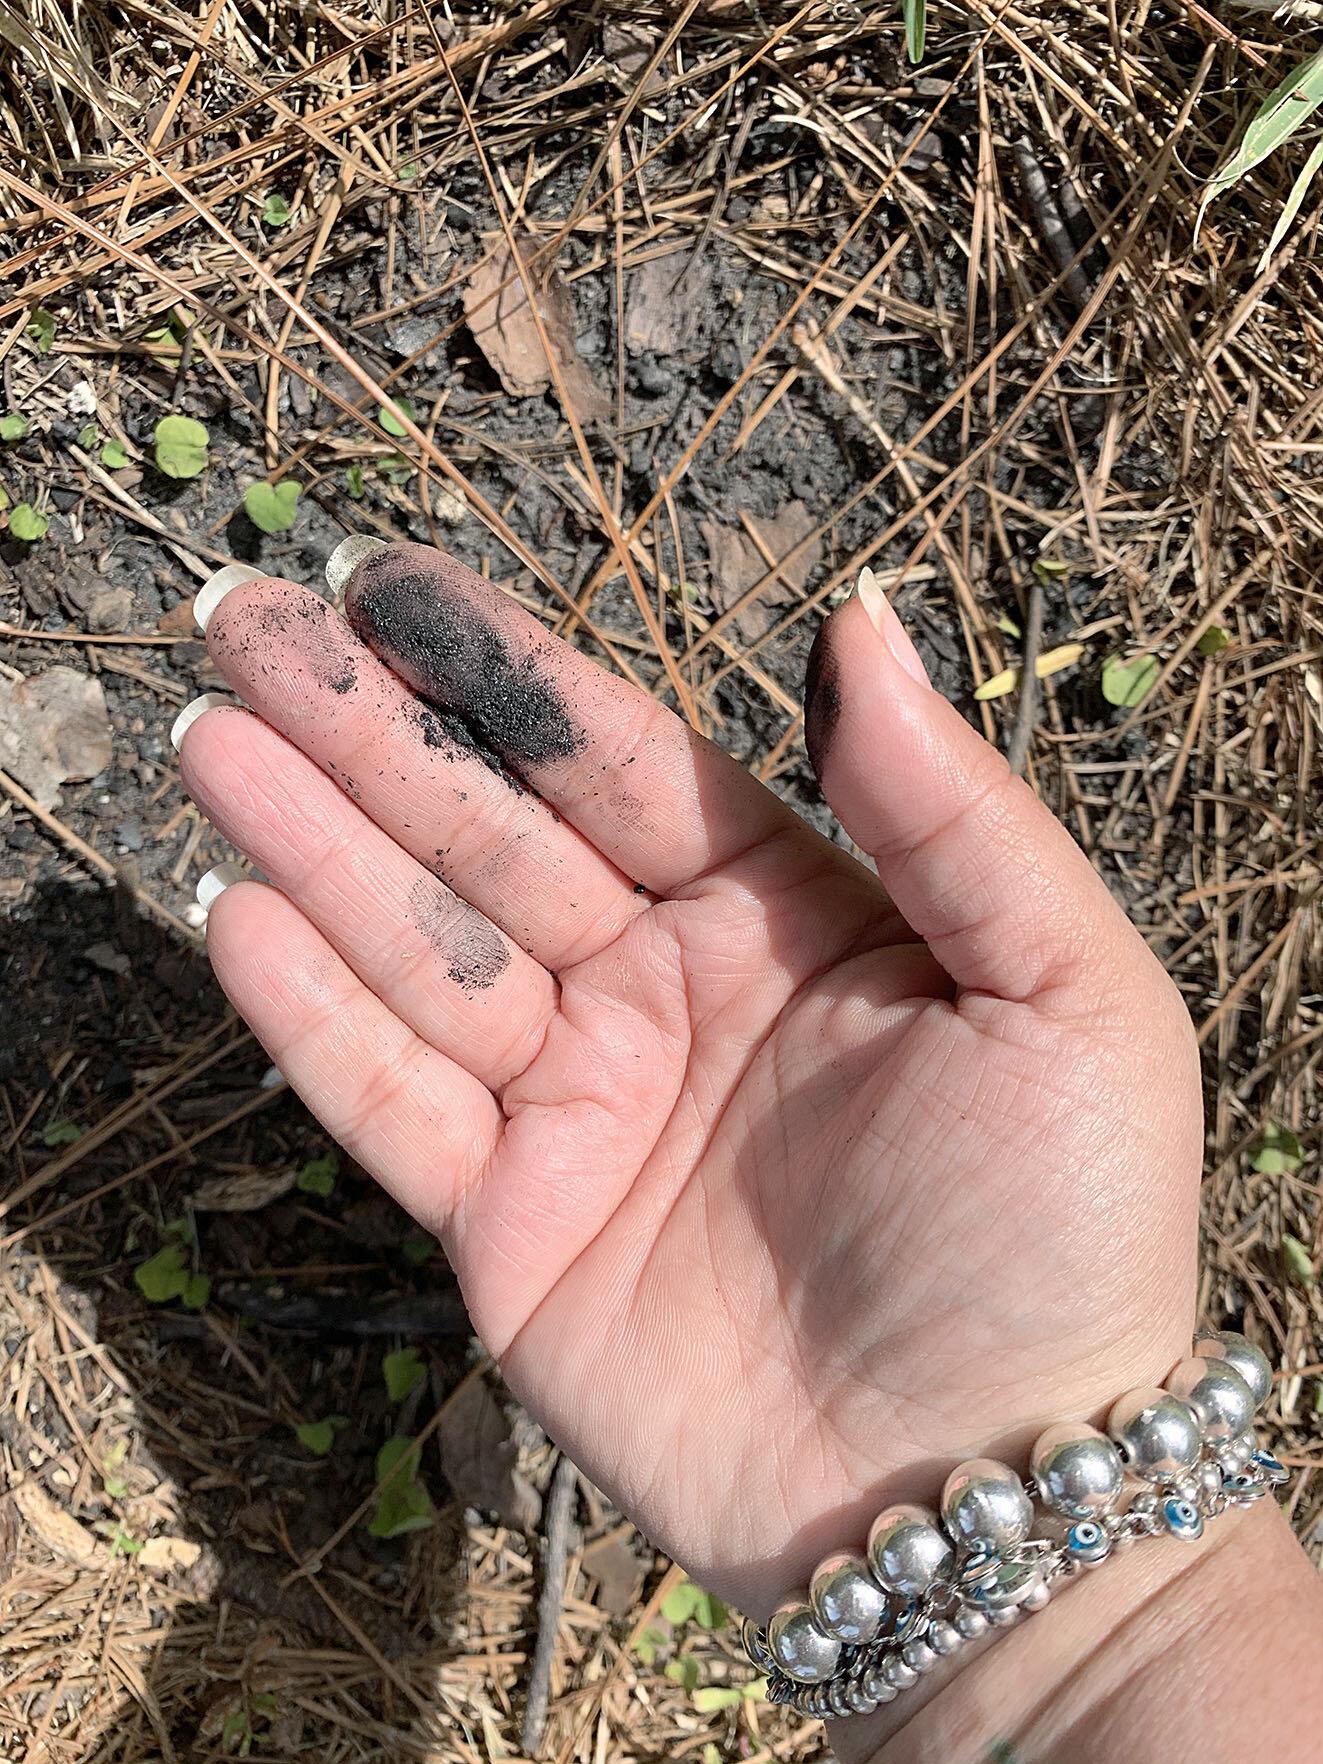 sheila-burgos-earthpigments-charcoal.jpg